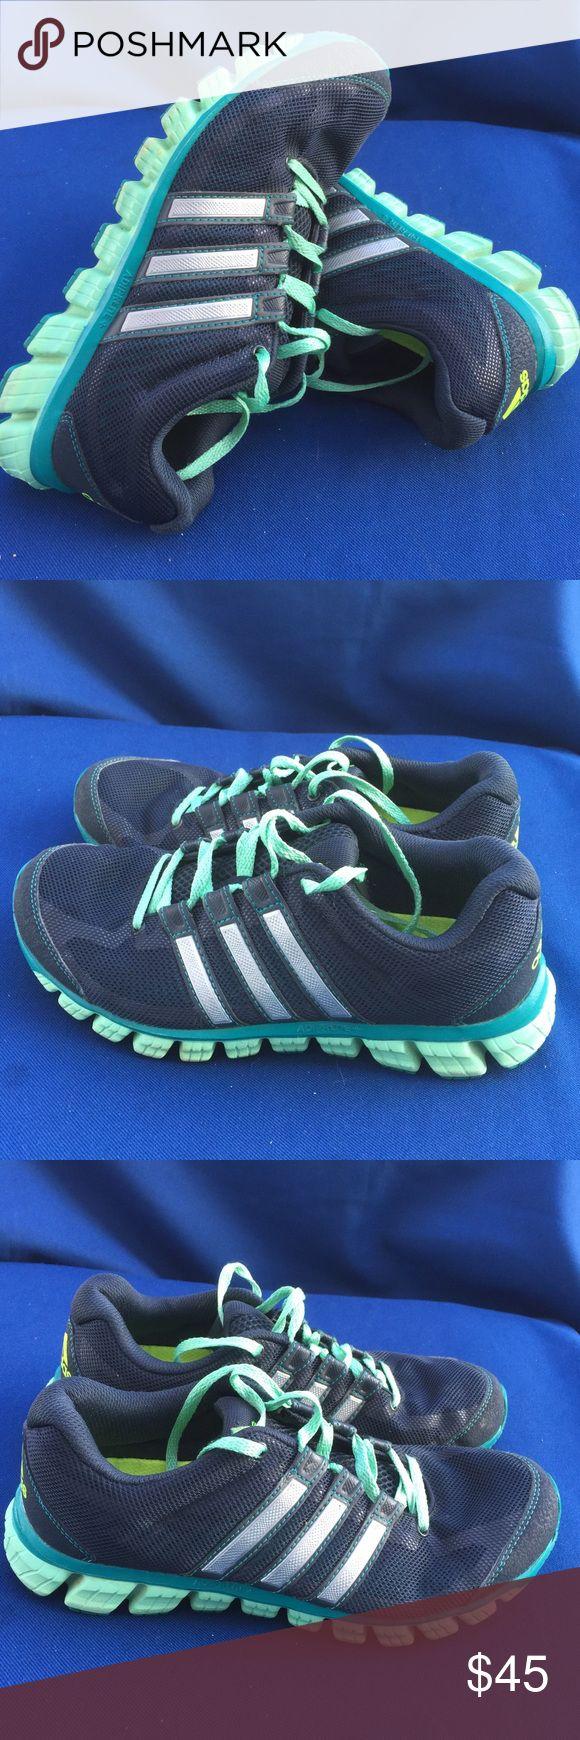 Adidas Adiprene size 7 Gently used adidas Shoes Sneakers